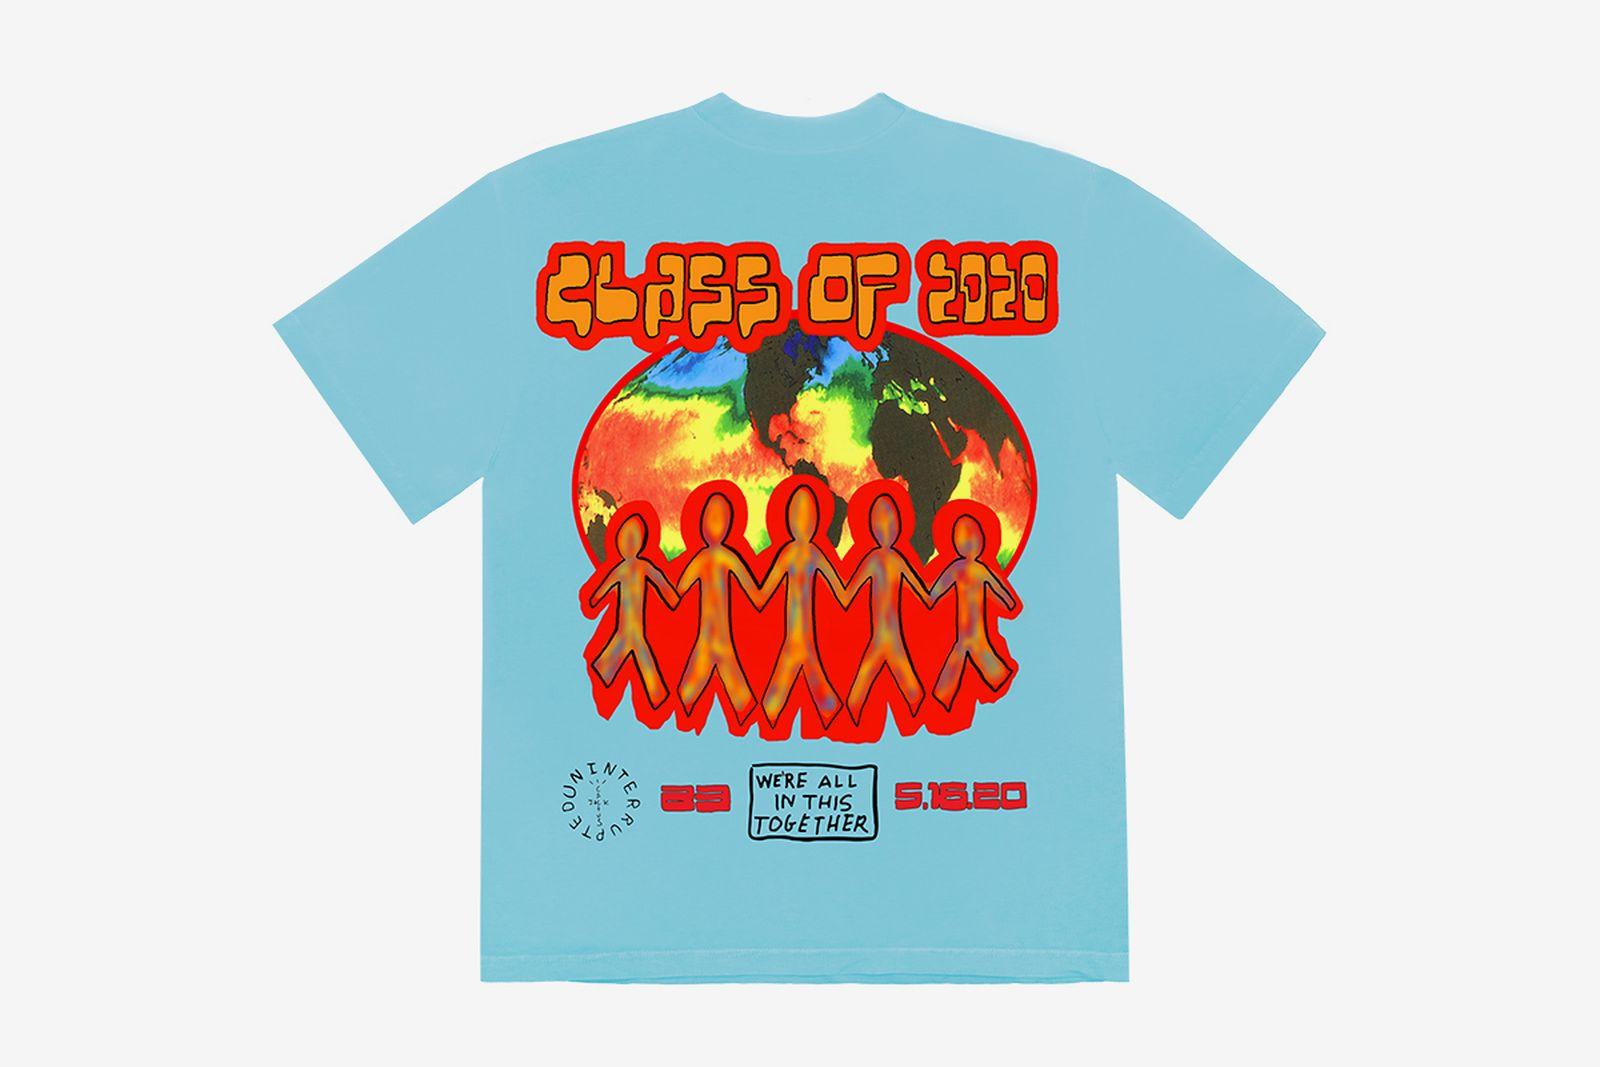 Travis Scott LeBron James graduation 2020 t-shirt